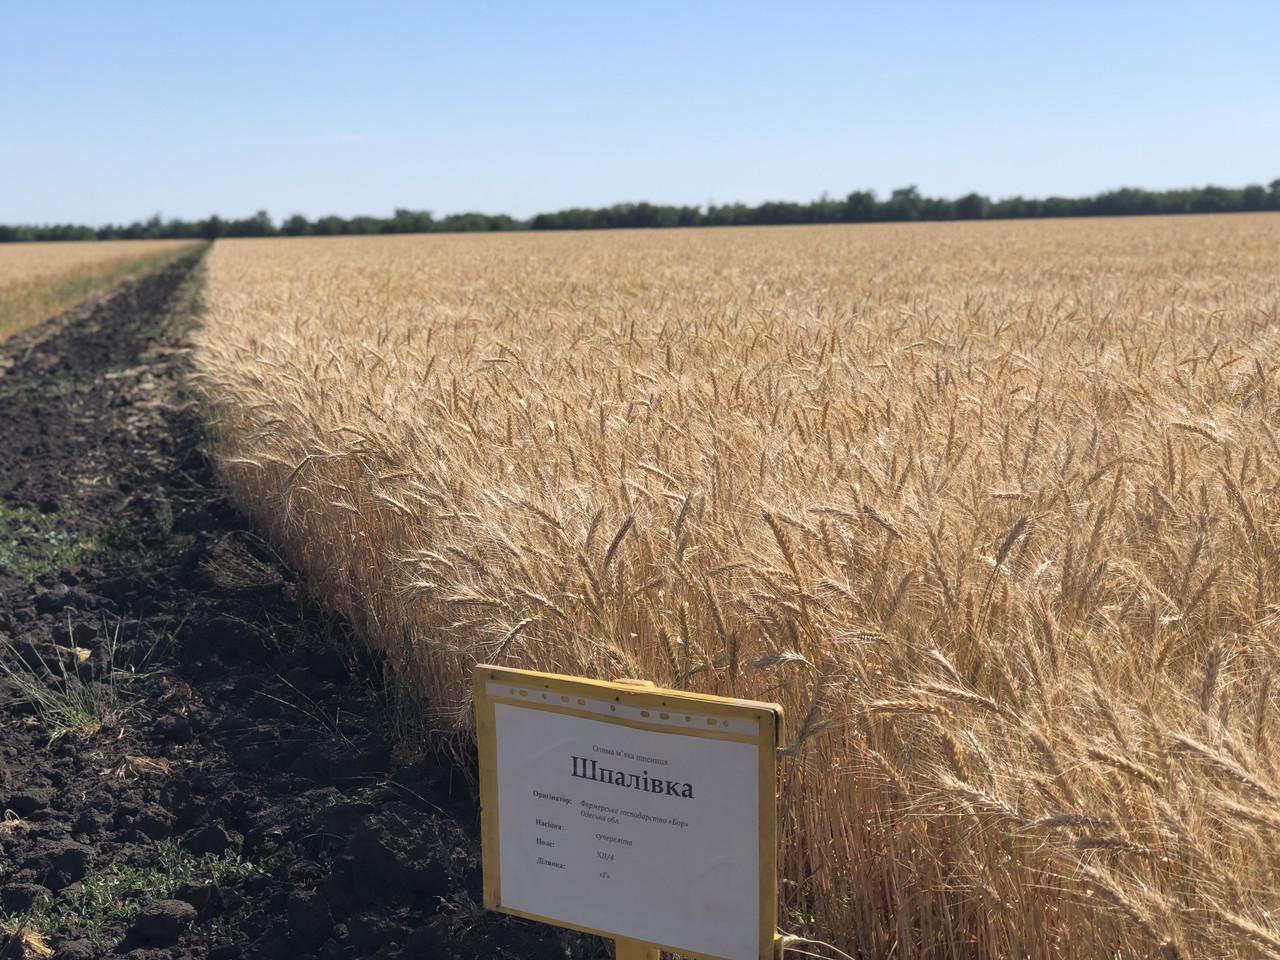 Семена пшеница озимая ШПАЛОВКА ЭЛИТА оригинатор ЧСС ОП БОР